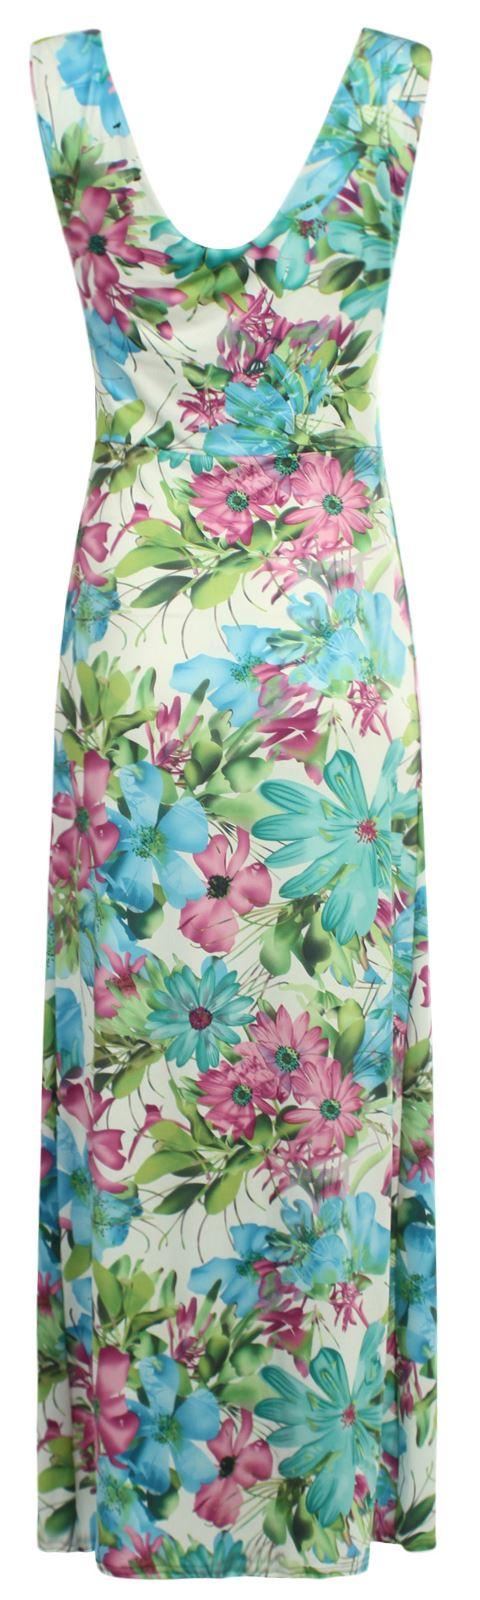 Womens Plus Size Contrast Knot Panel Summer Floral Print Grecian Maxi Dress 8-26